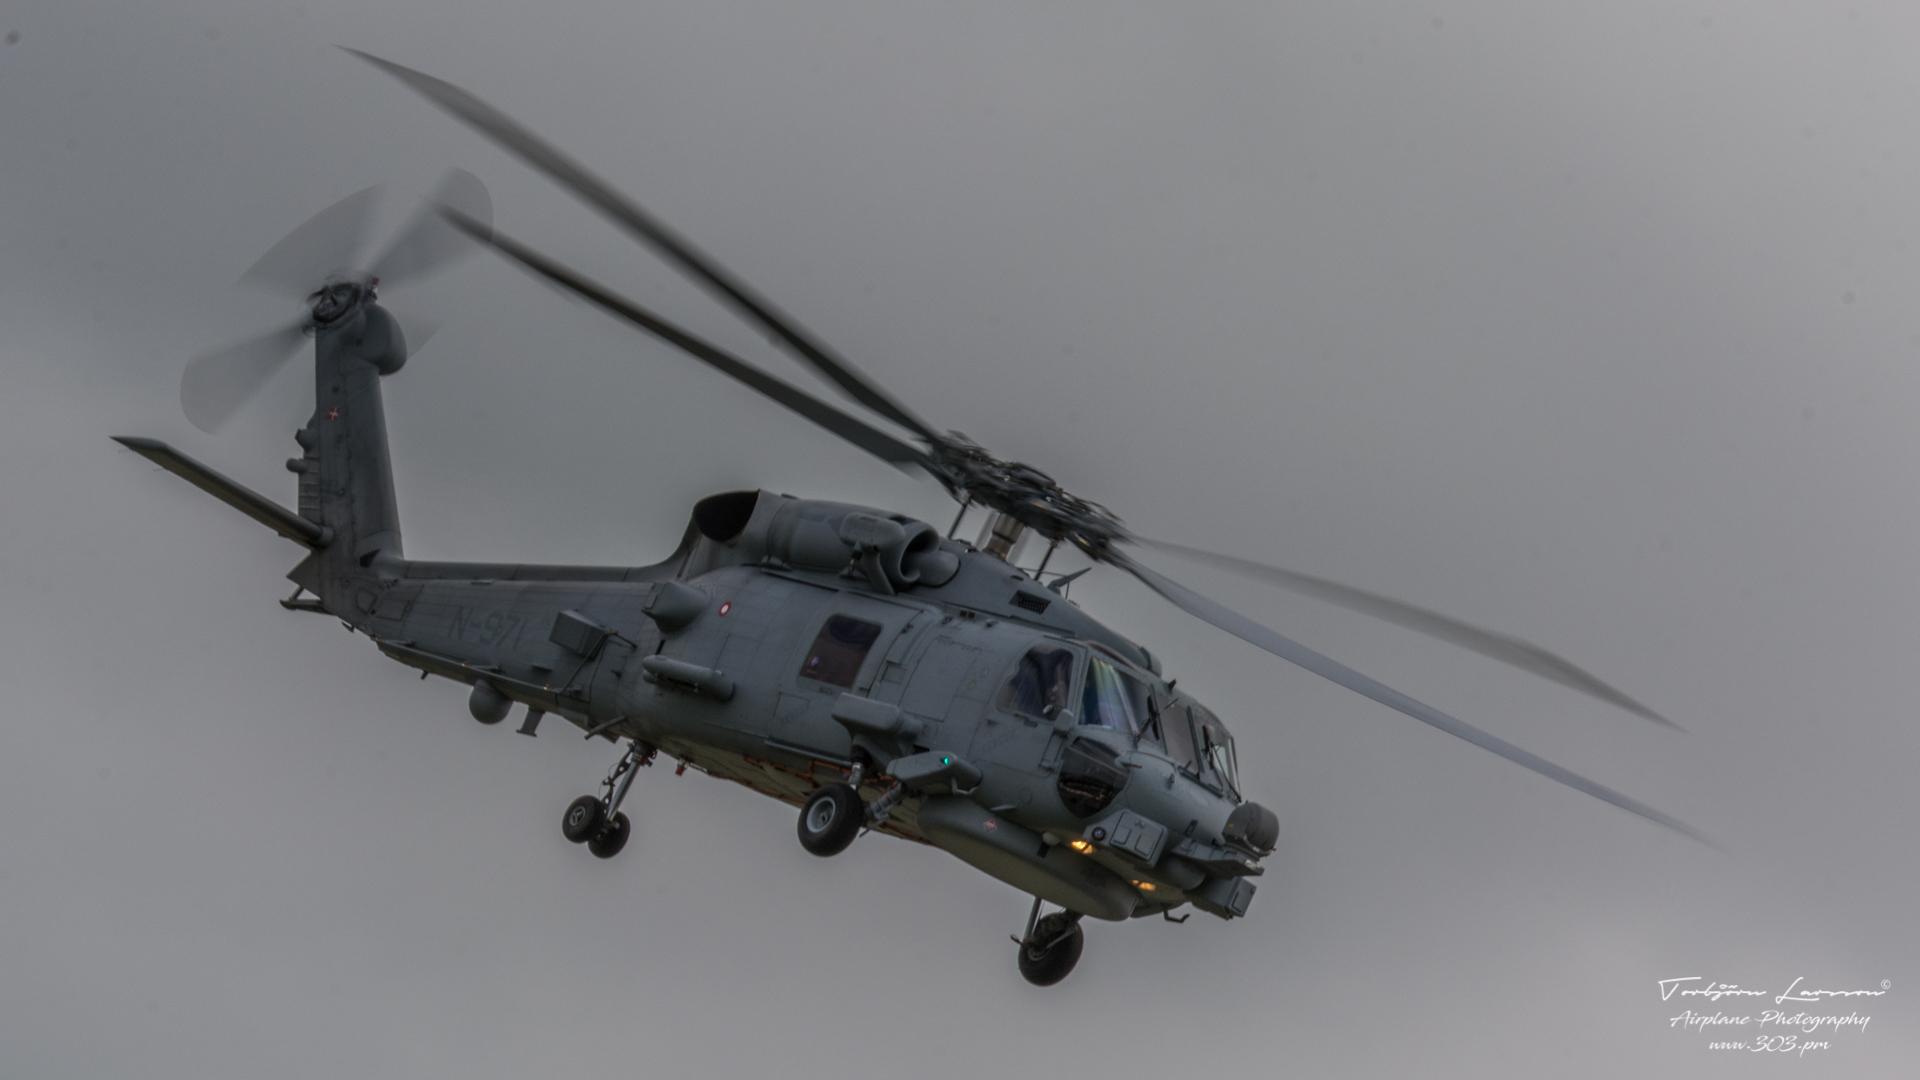 Sikorsky SH-60 - Seahawk